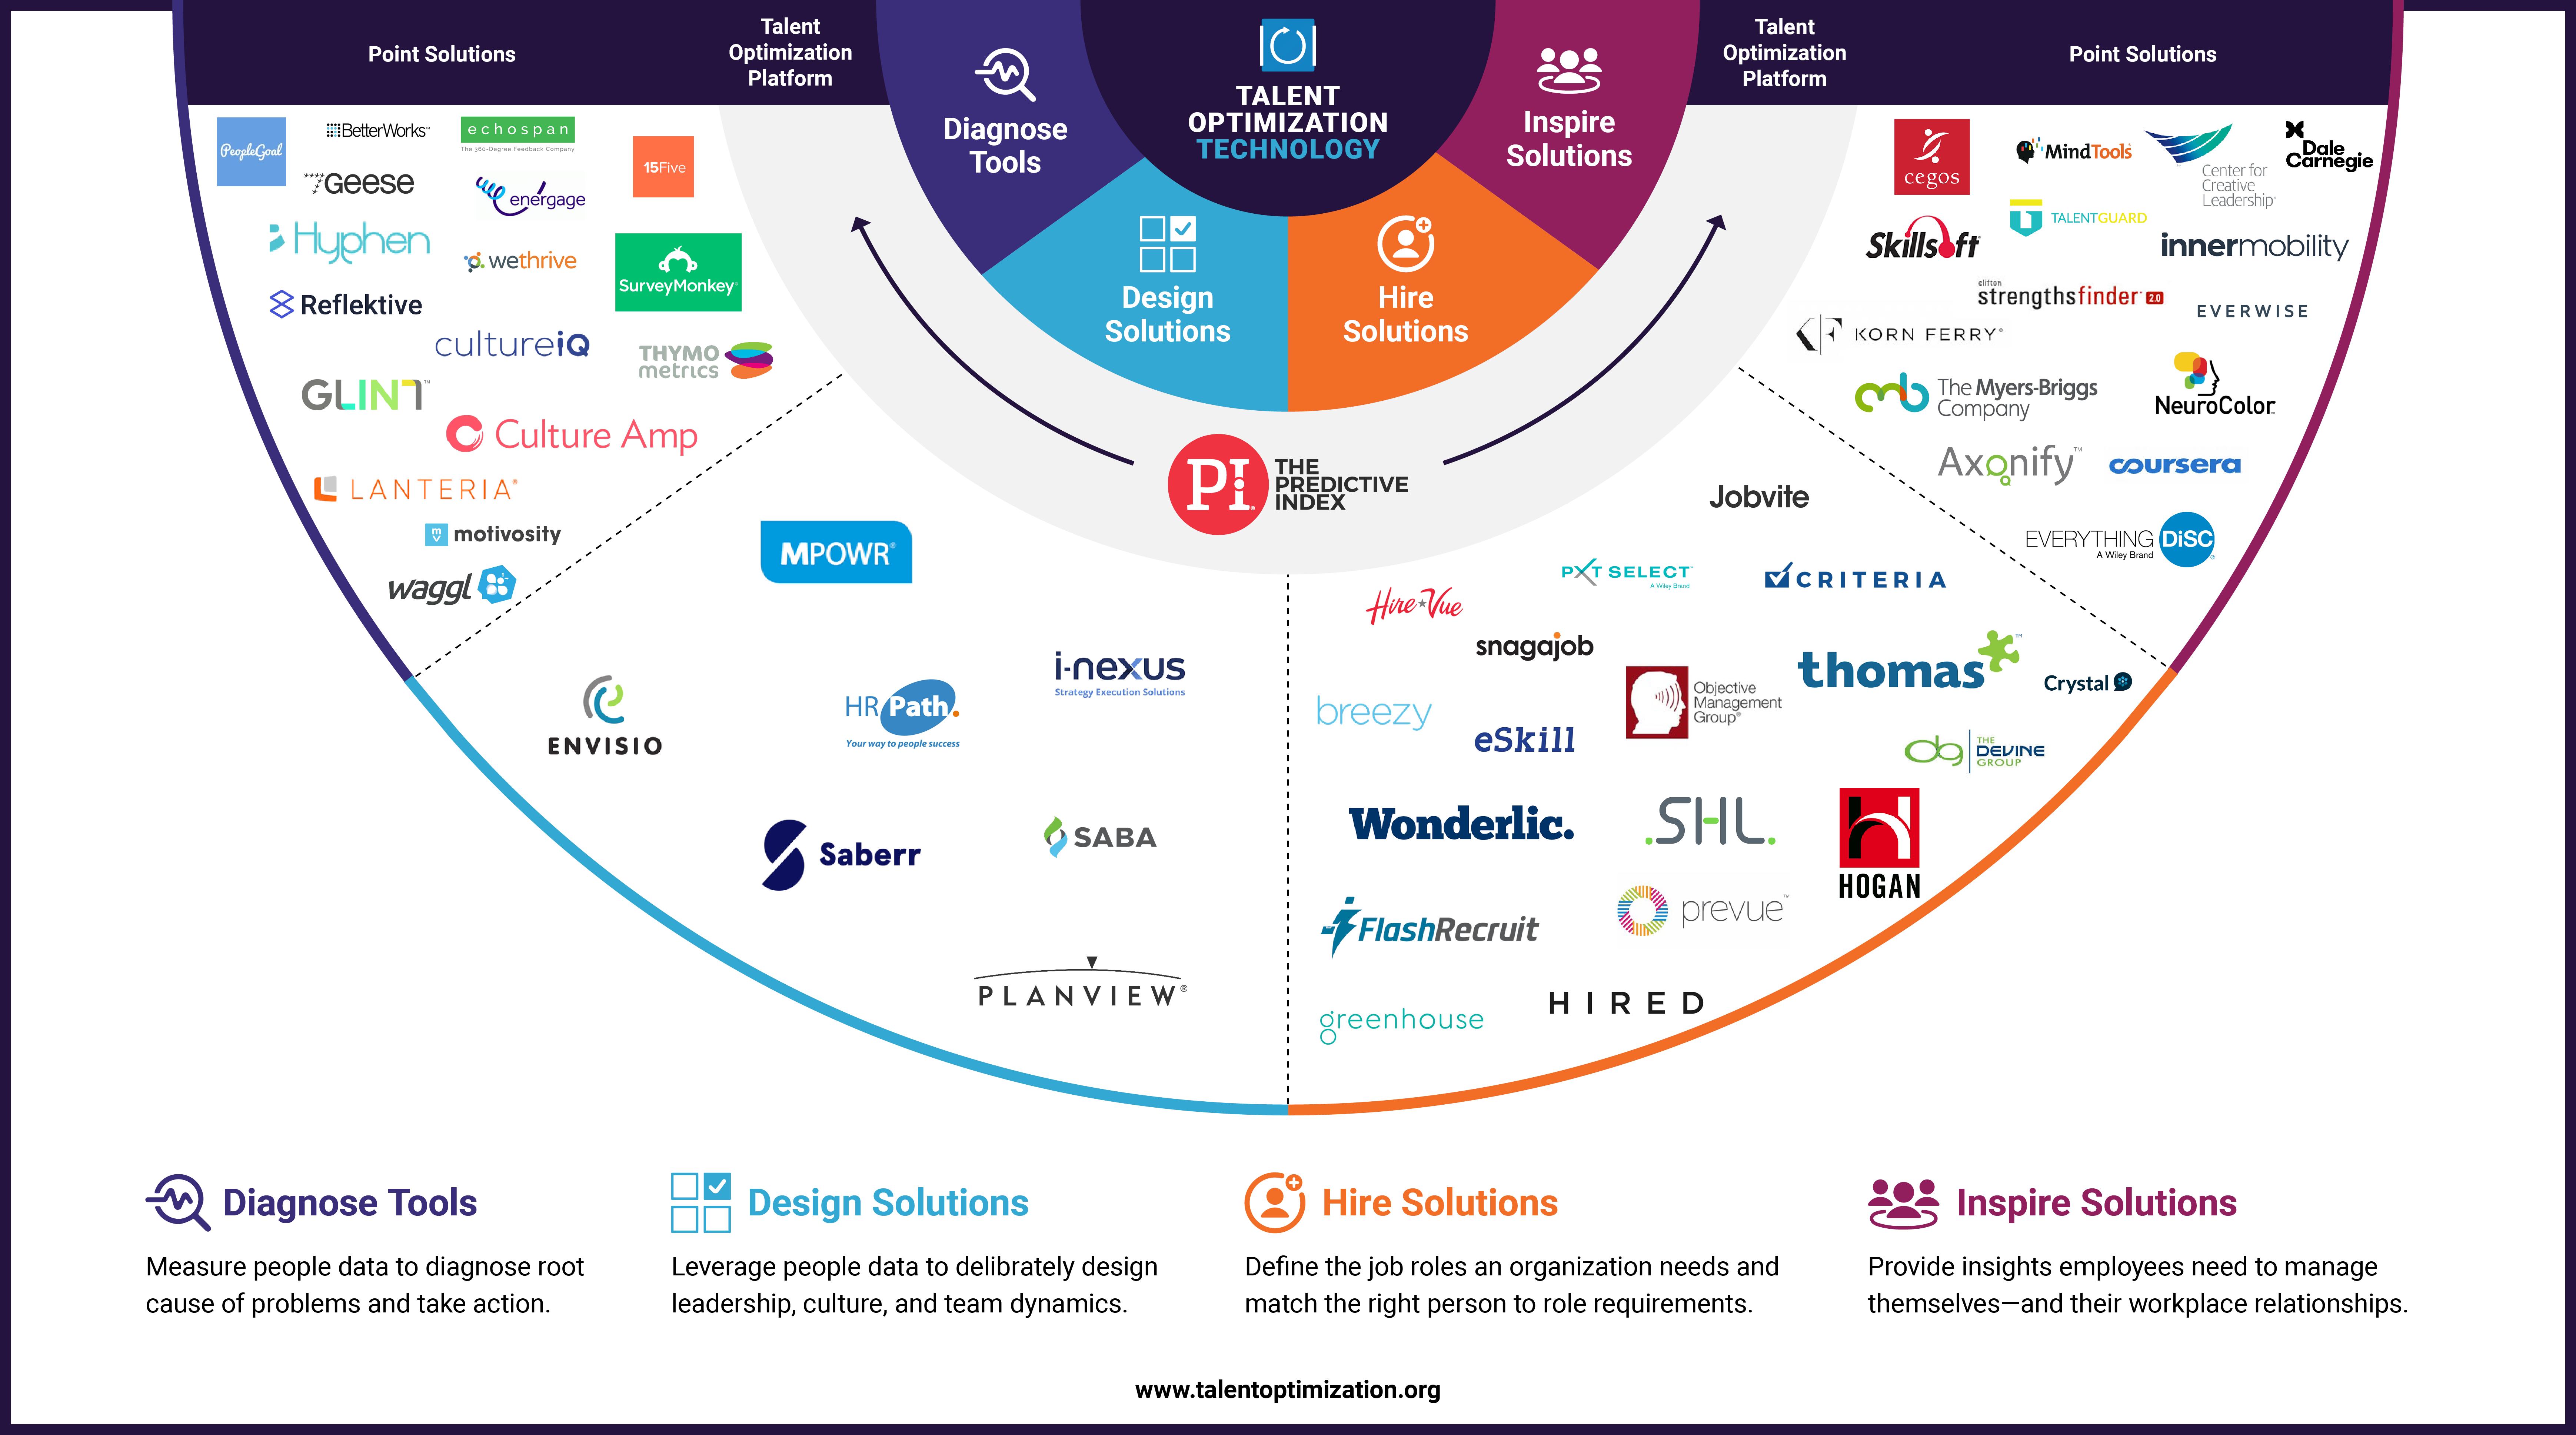 Talent Optimization Market Map (Technology)